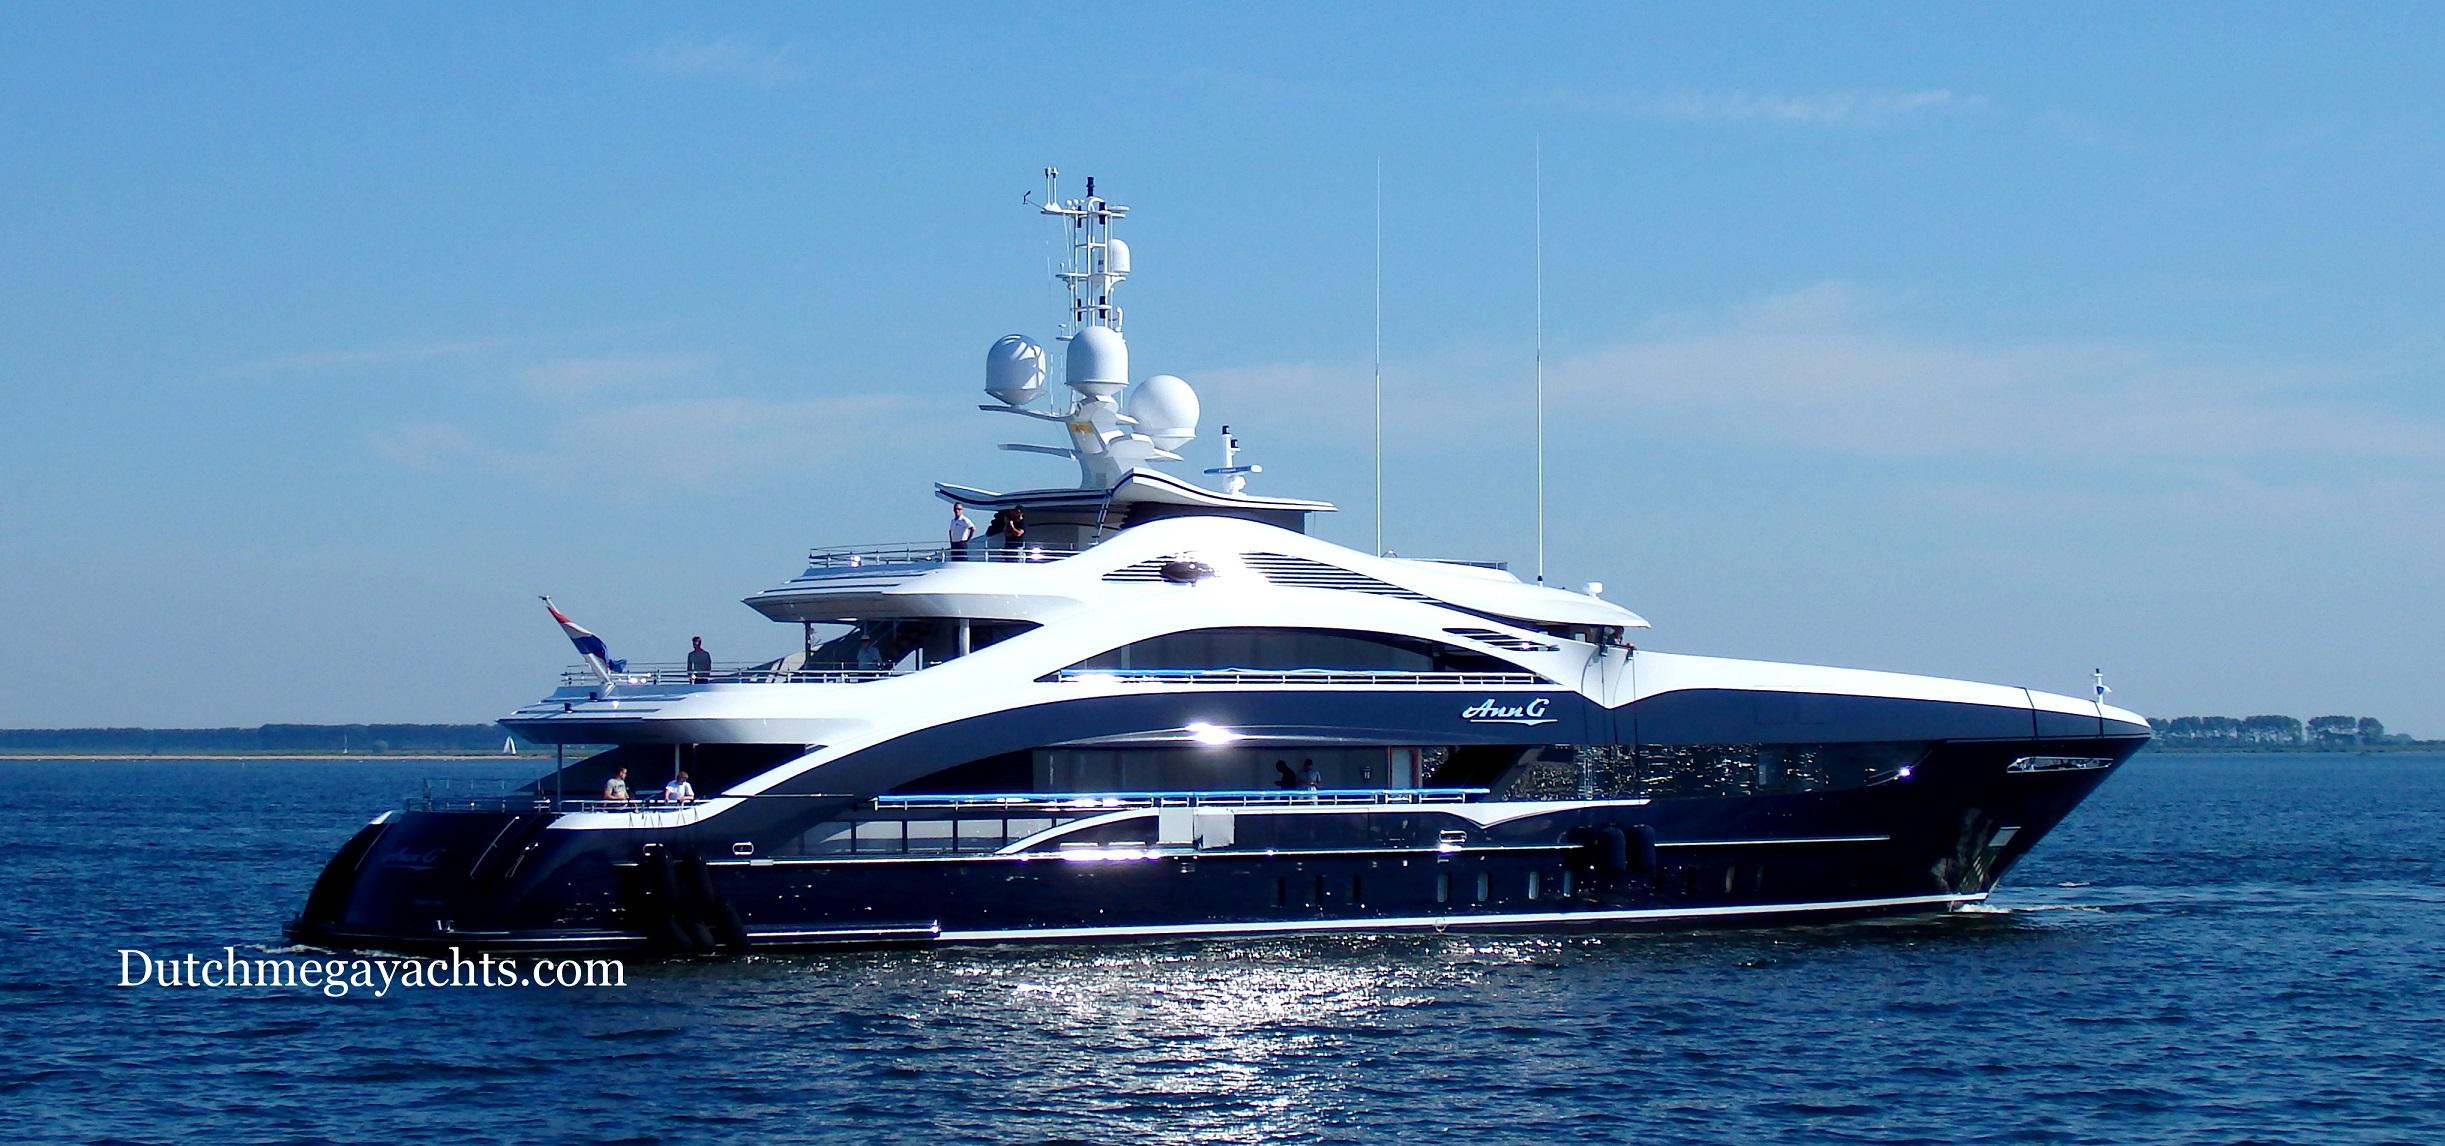 Luxury Motor Yacht Ann G Photo By Dutchmegayachts